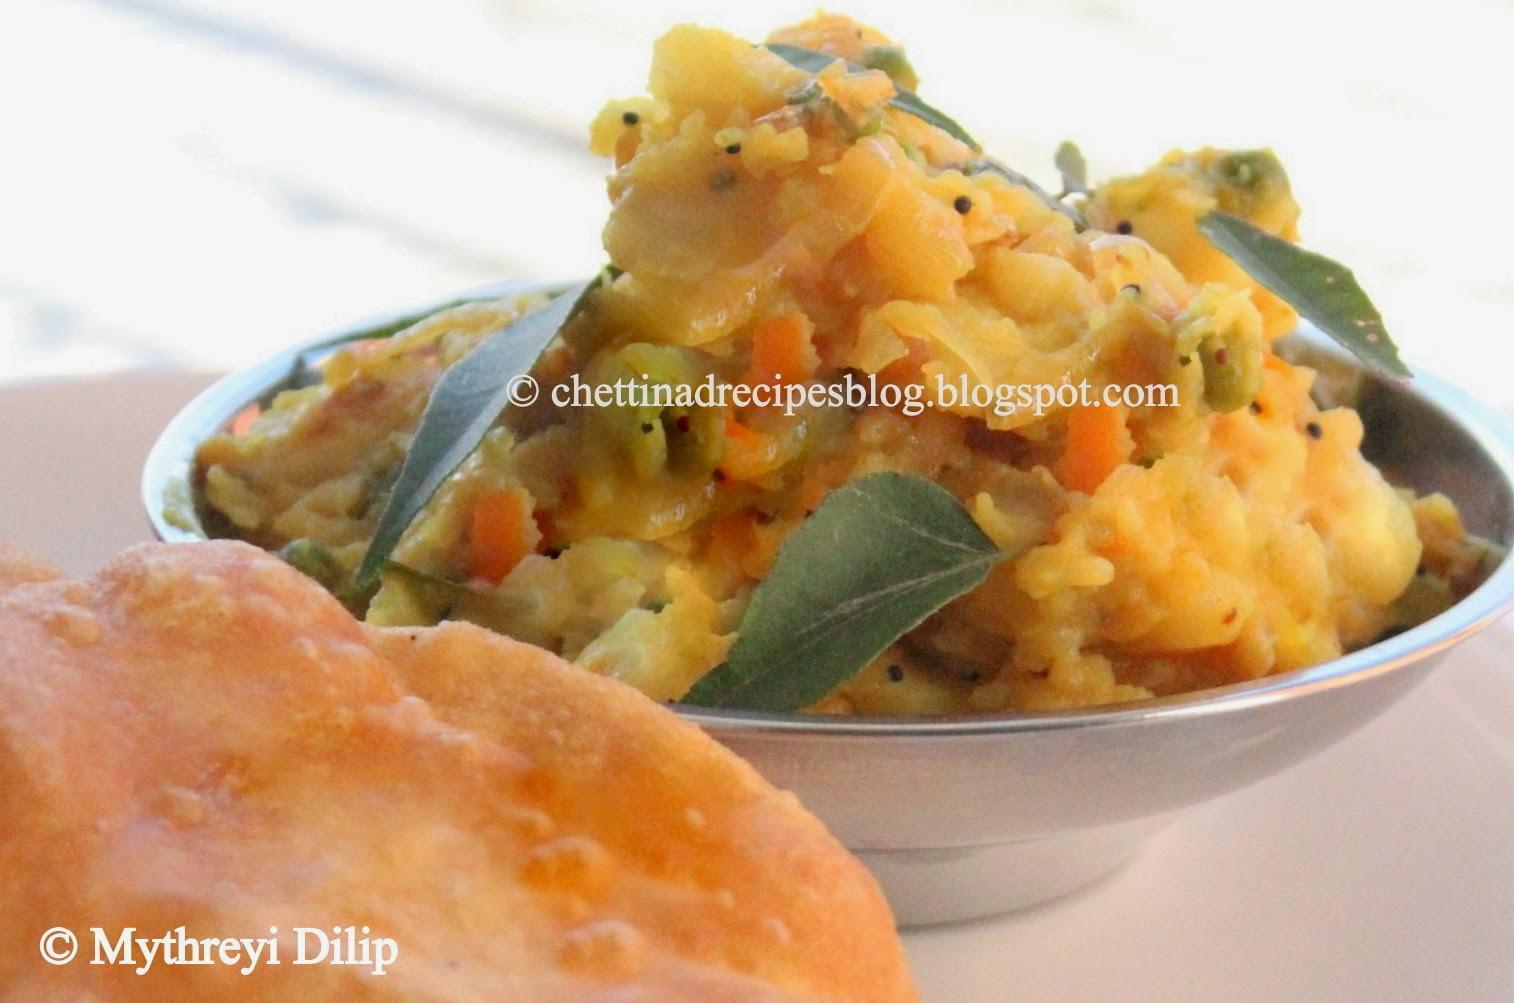 poori kizhangu recipe / poori masala recipe / potato masala for poori